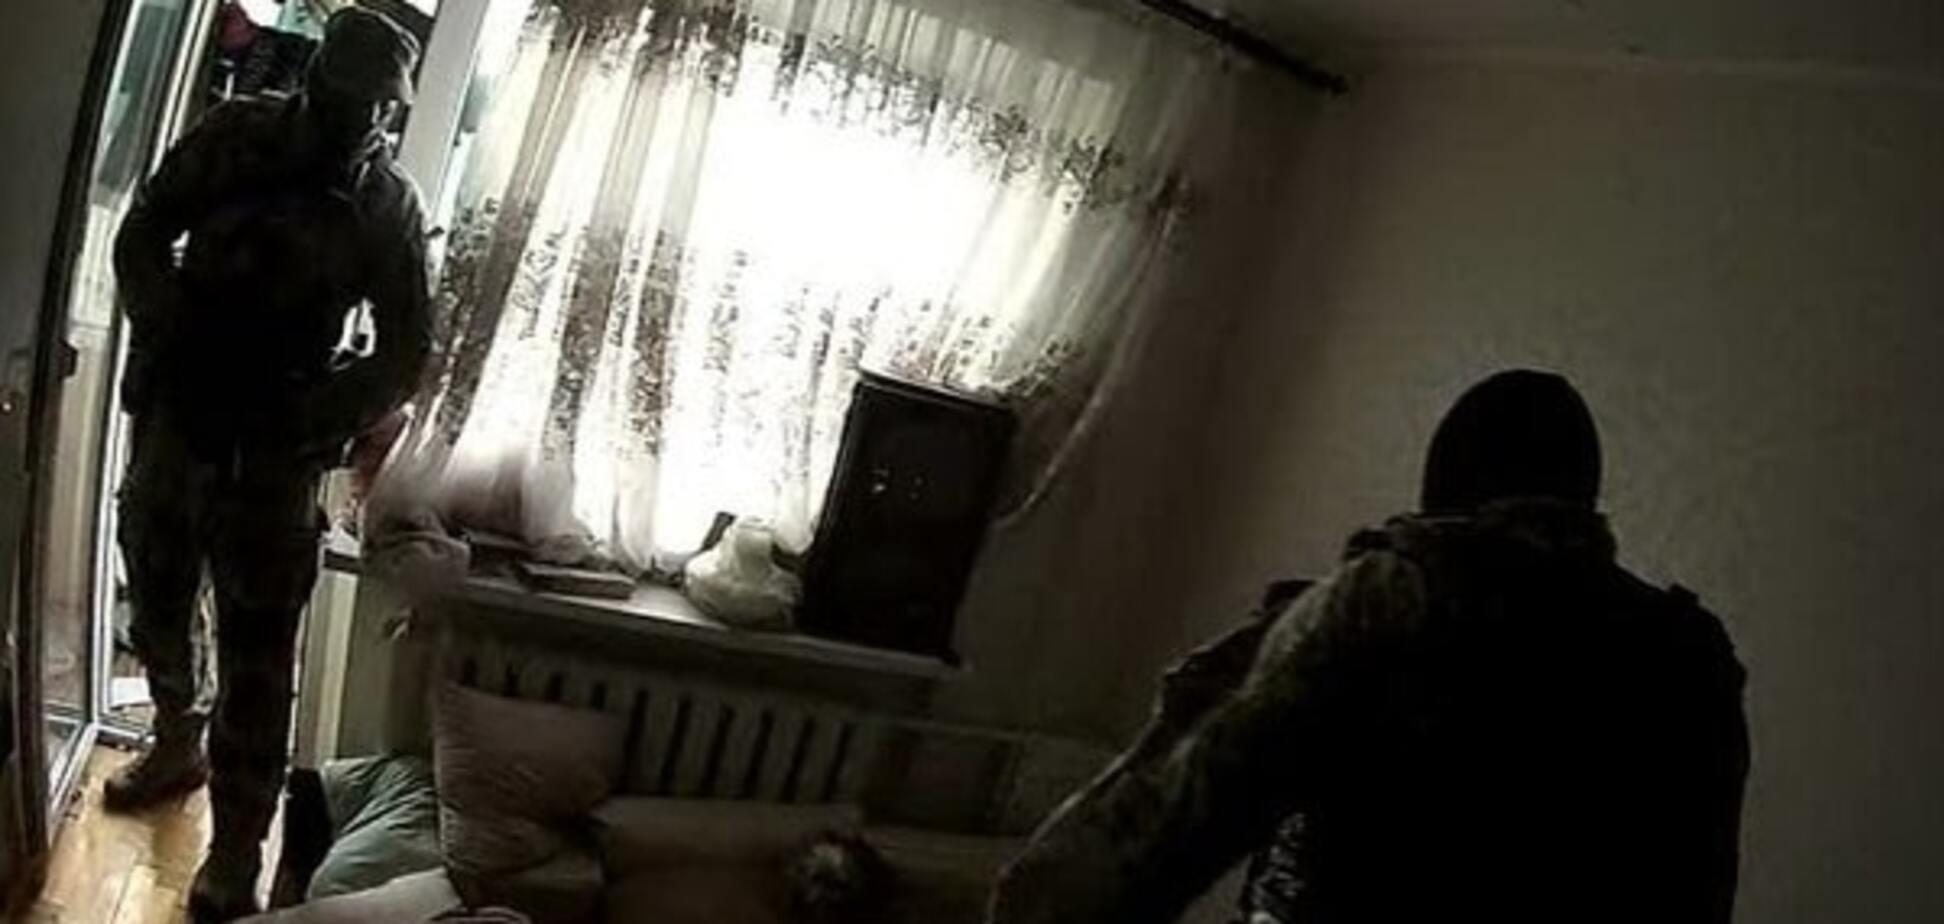 задержание террориста \'ДНР\'